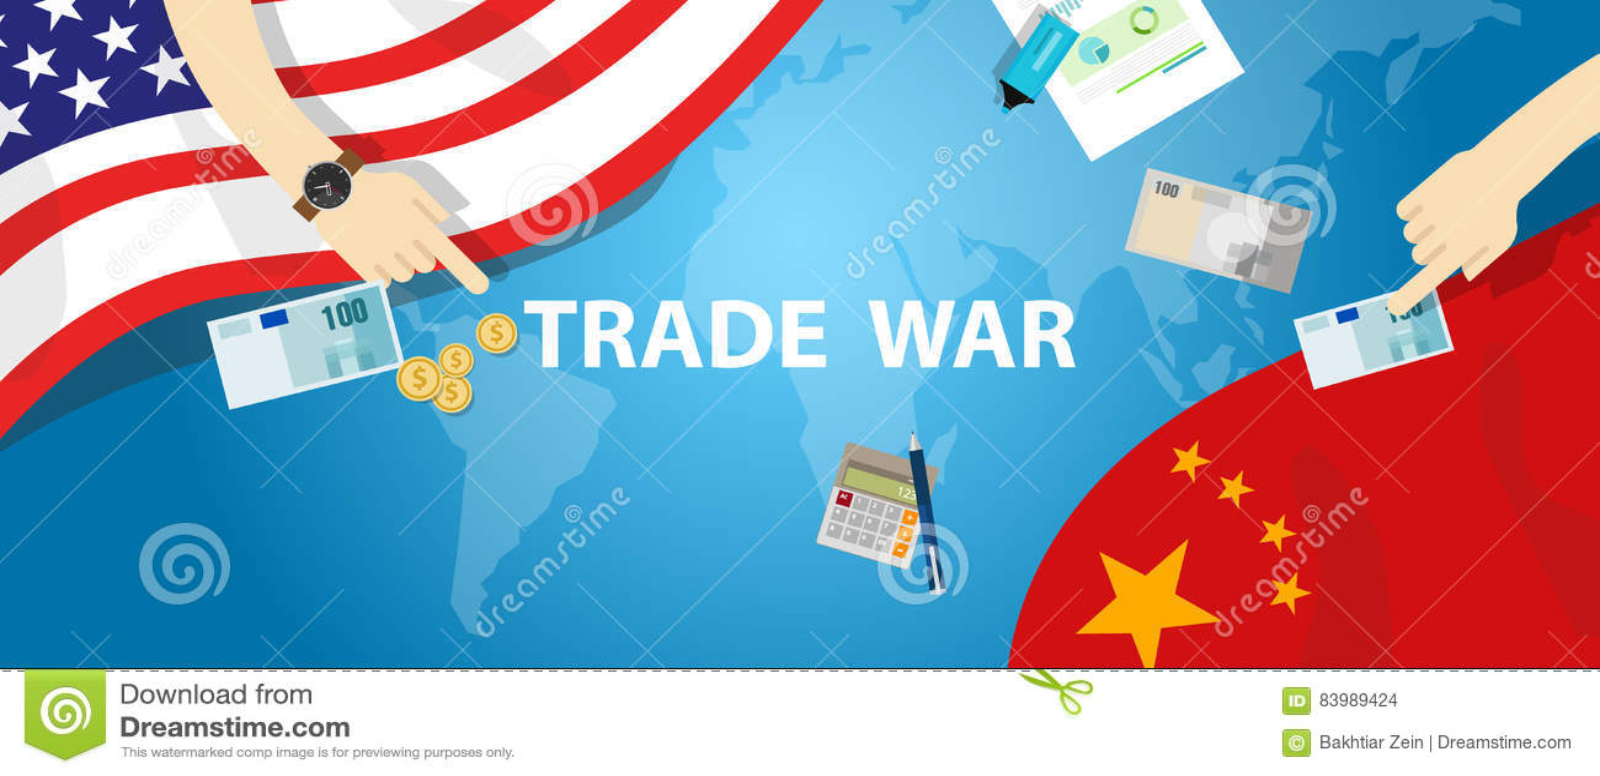 Trade war America China tariff business global exchange international